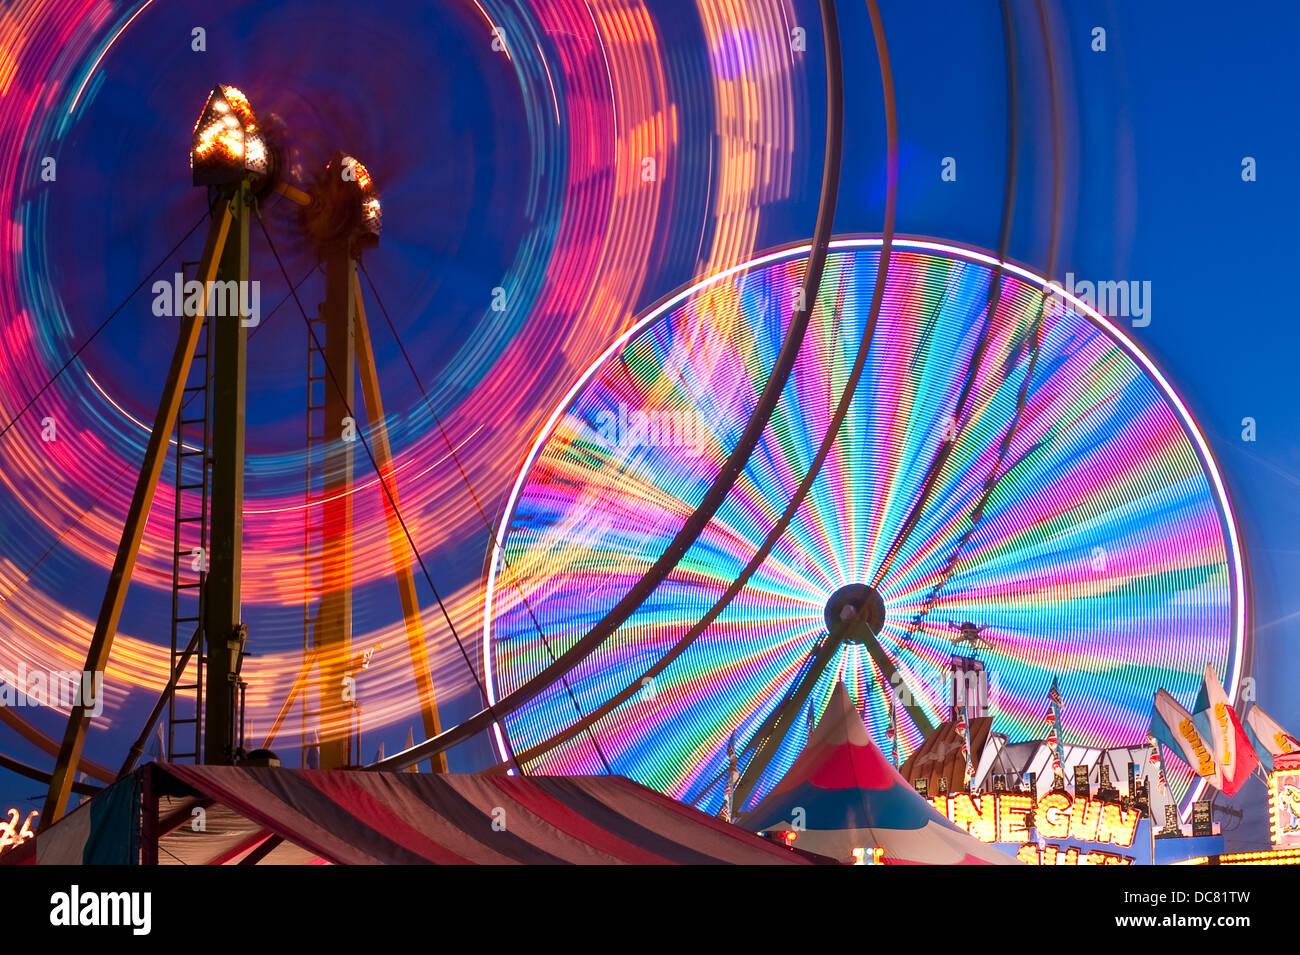 Evergreen State Fair ferris wheel - Stock Image